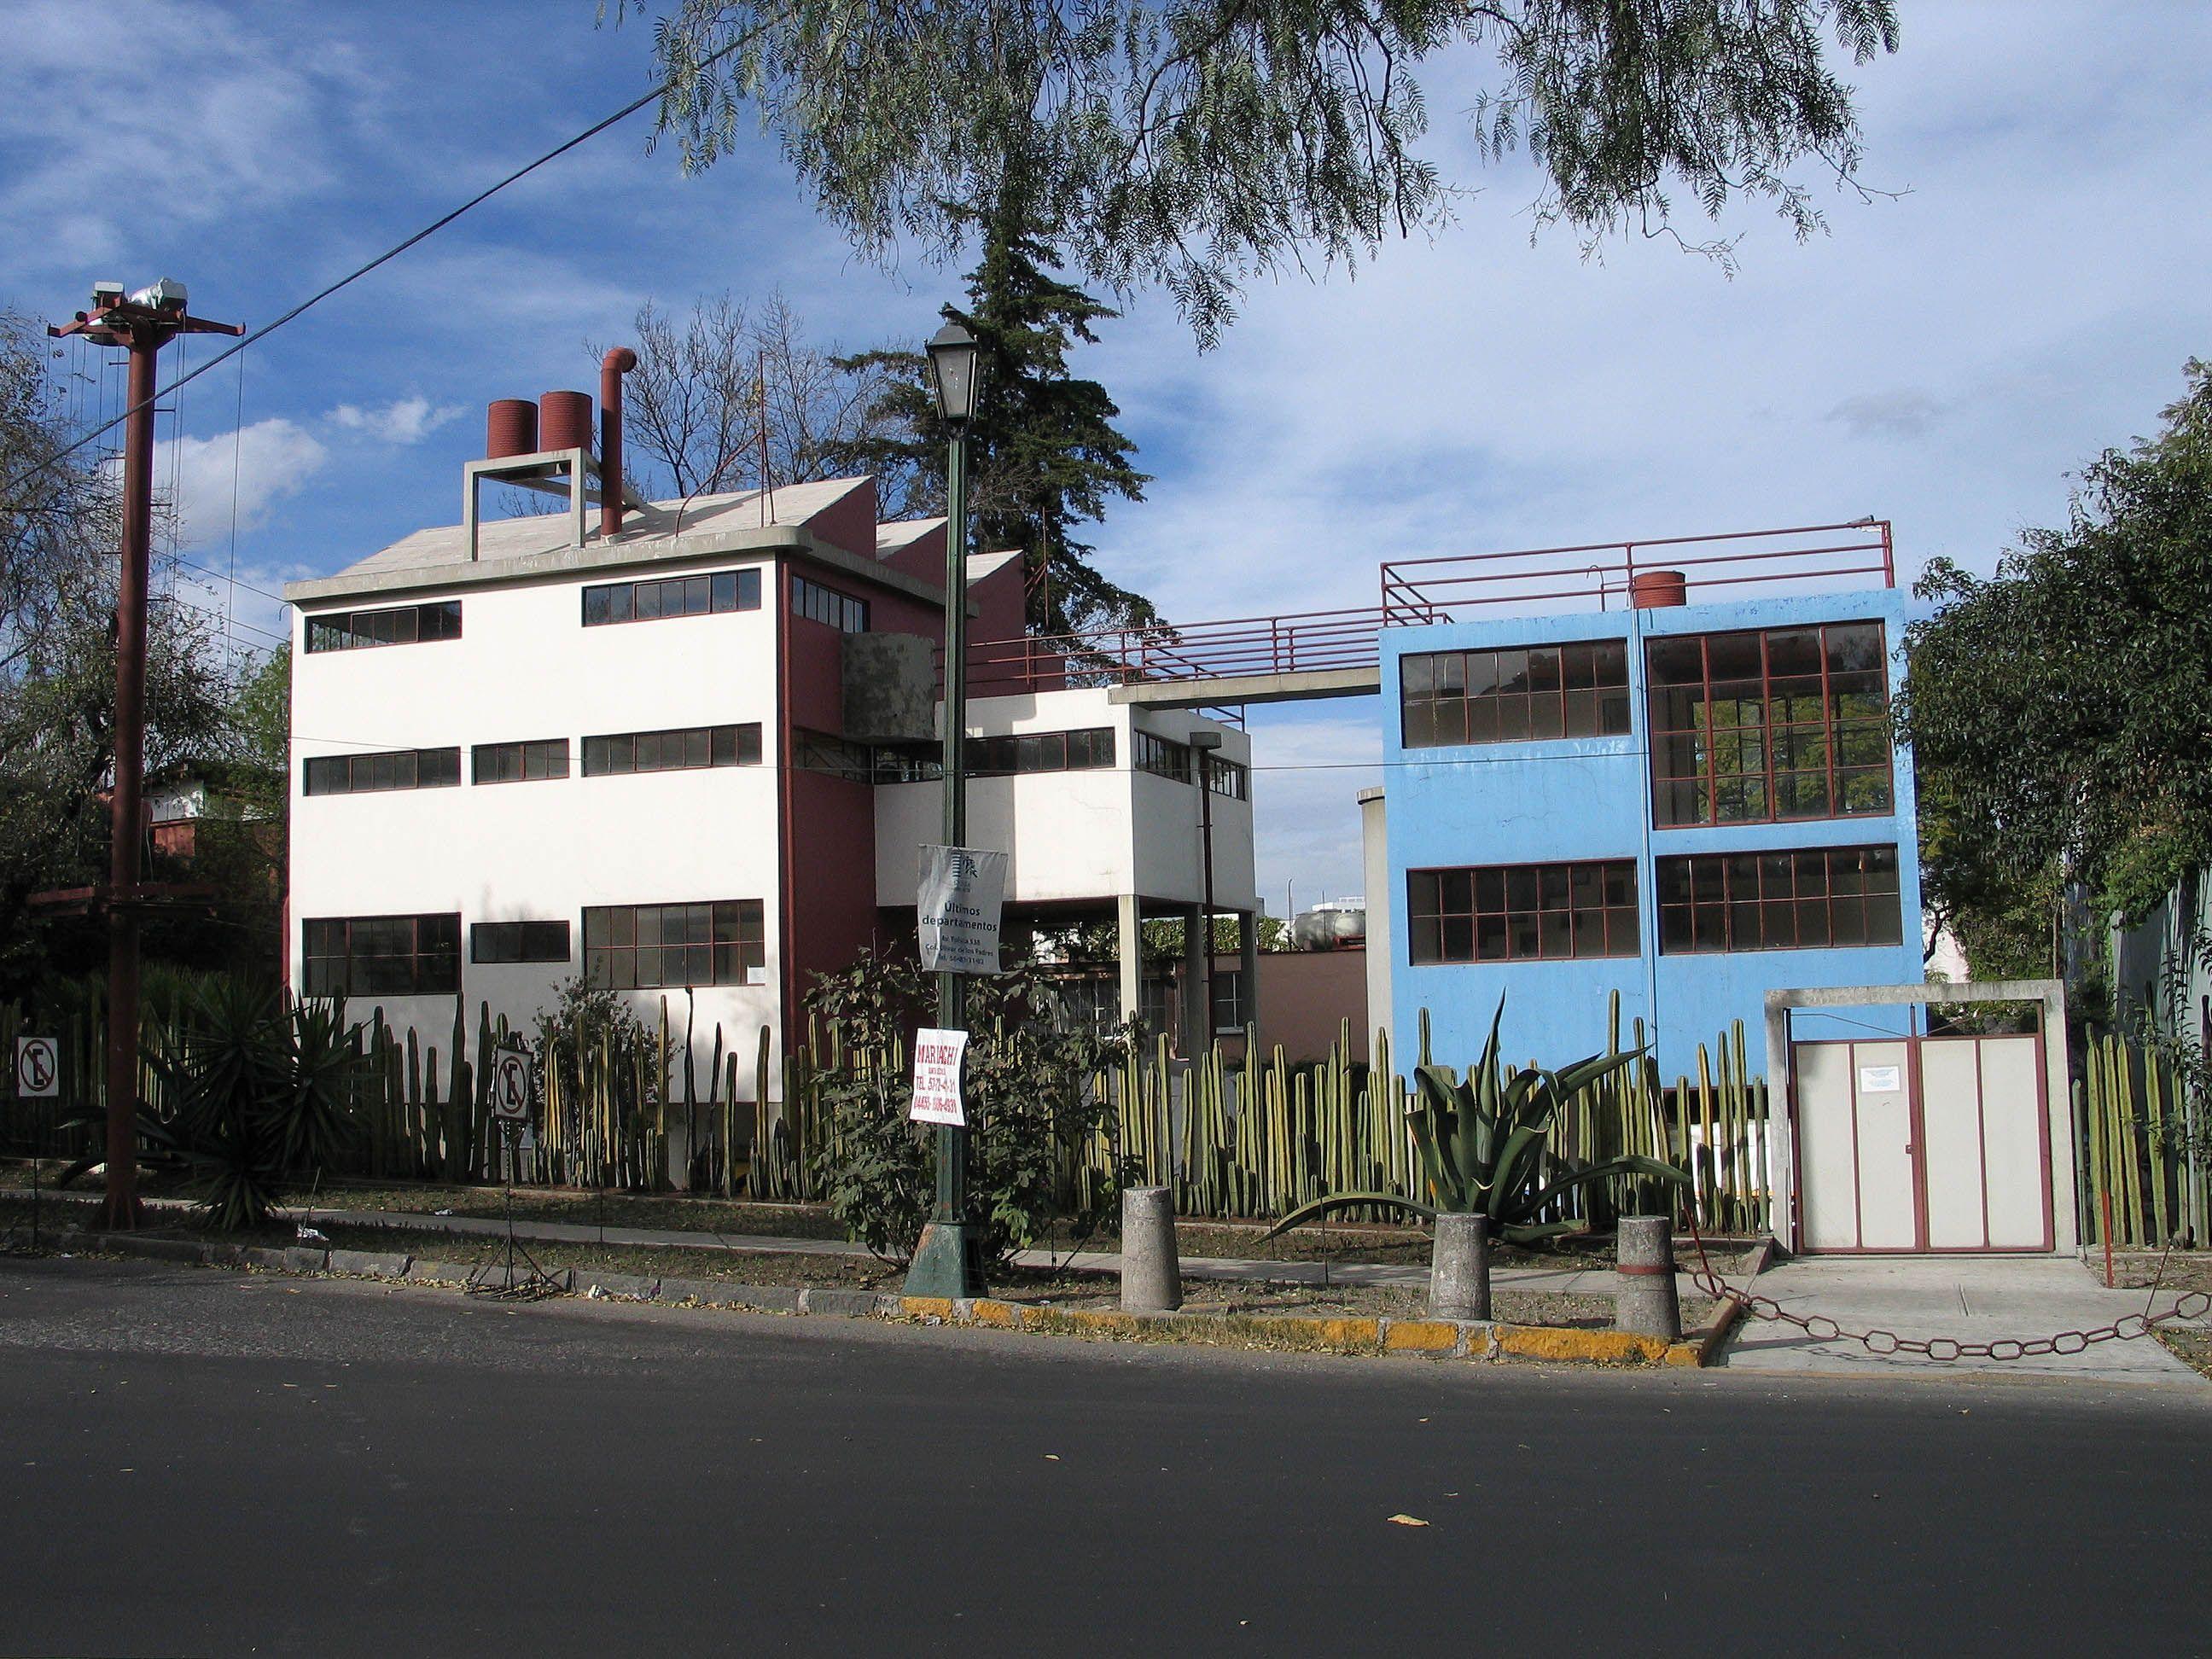 Casa de Diego y Frida -  Juan O'Gorman